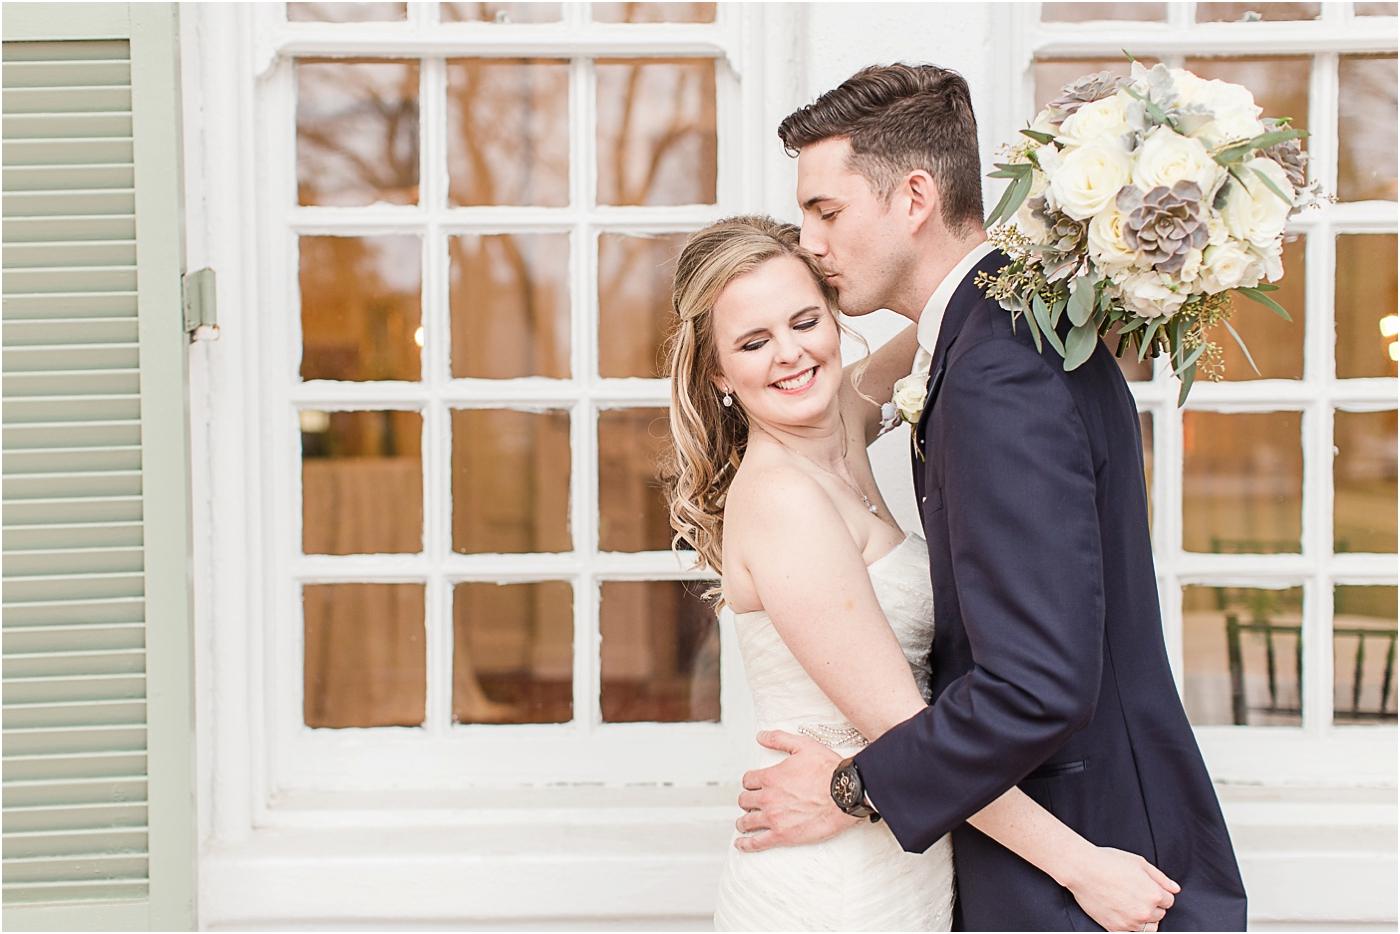 Greyrock-mansion-wedding-56.jpg